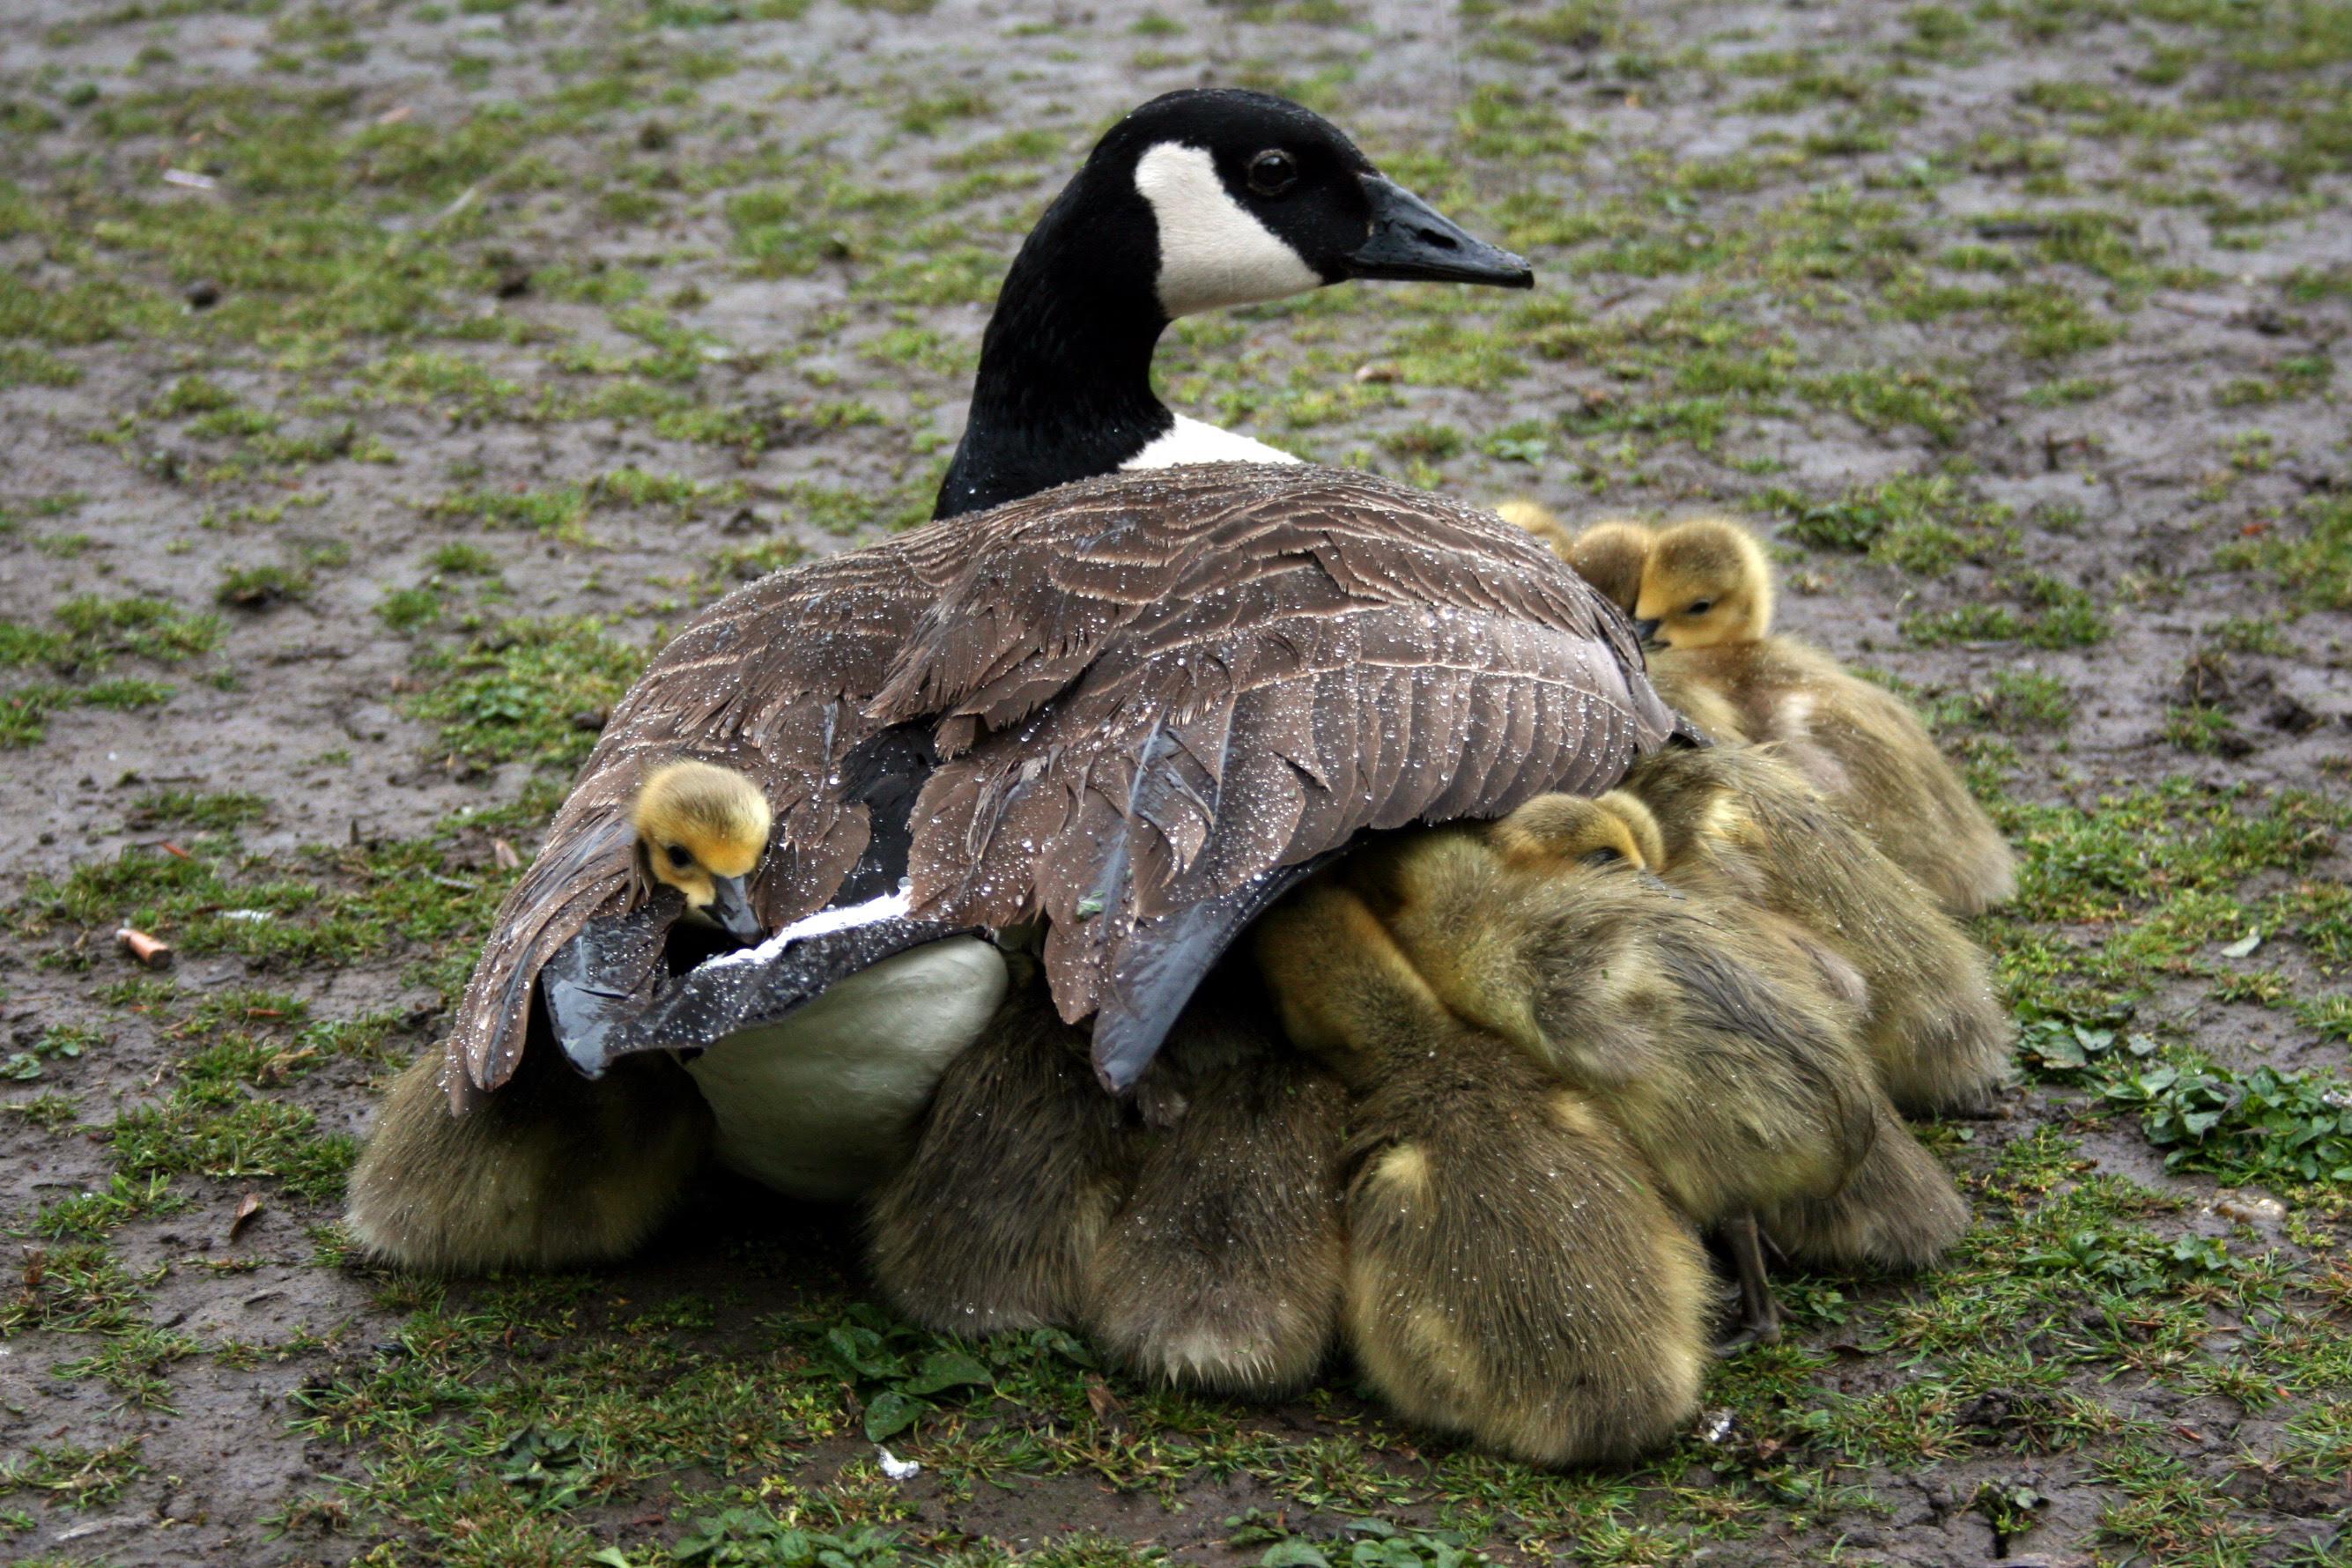 http://upload.wikimedia.org/wikipedia/commons/6/6e/Mother_shelters_goslings.jpg